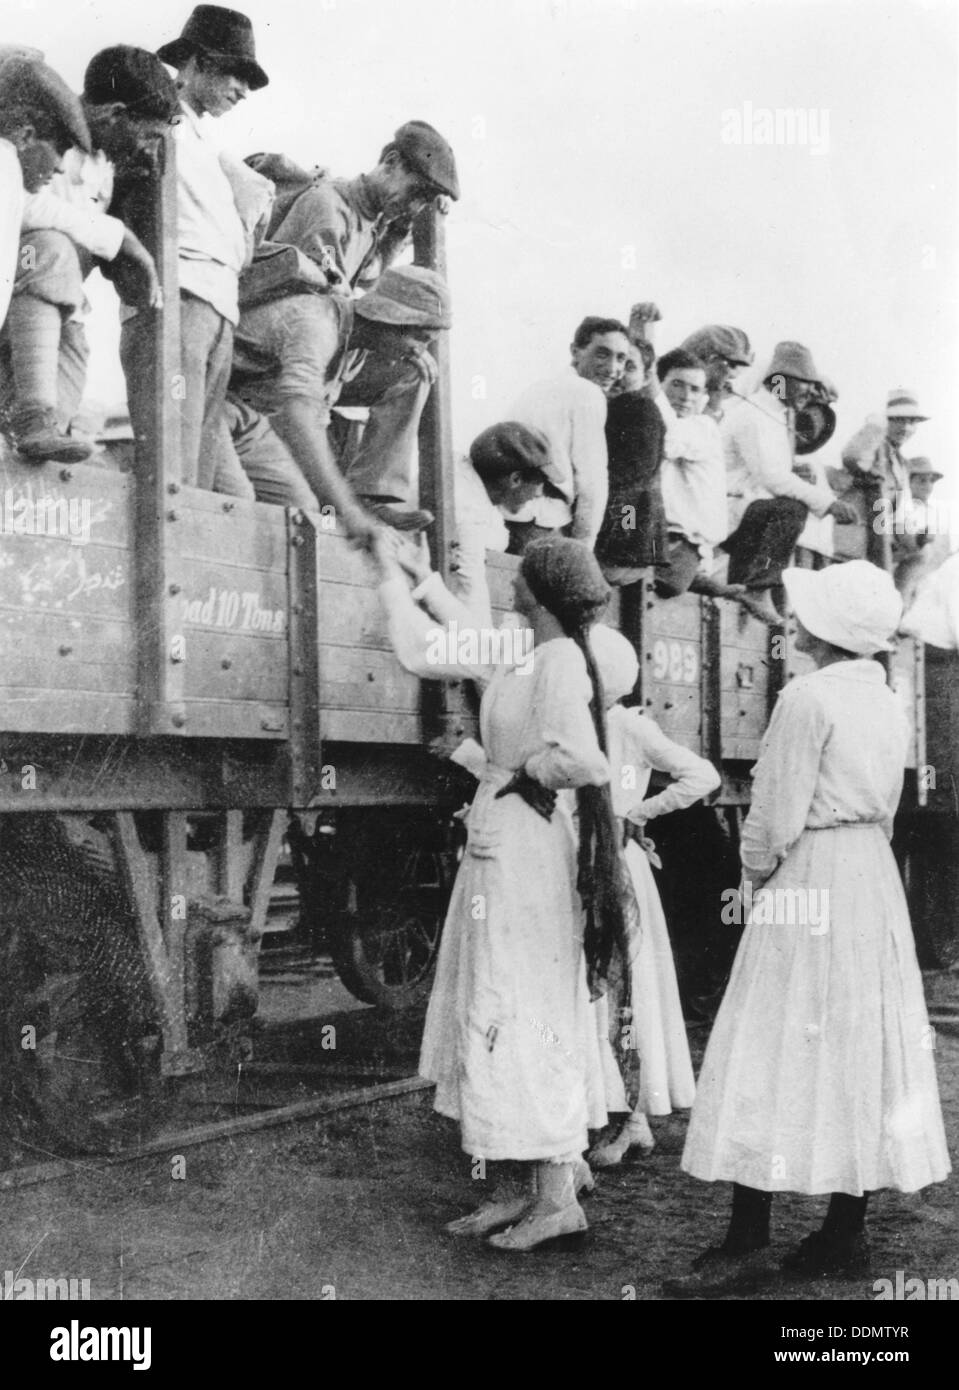 Members of the Jewish Legion bid farewell to their families, World War I, 1915-1918. - Stock Image